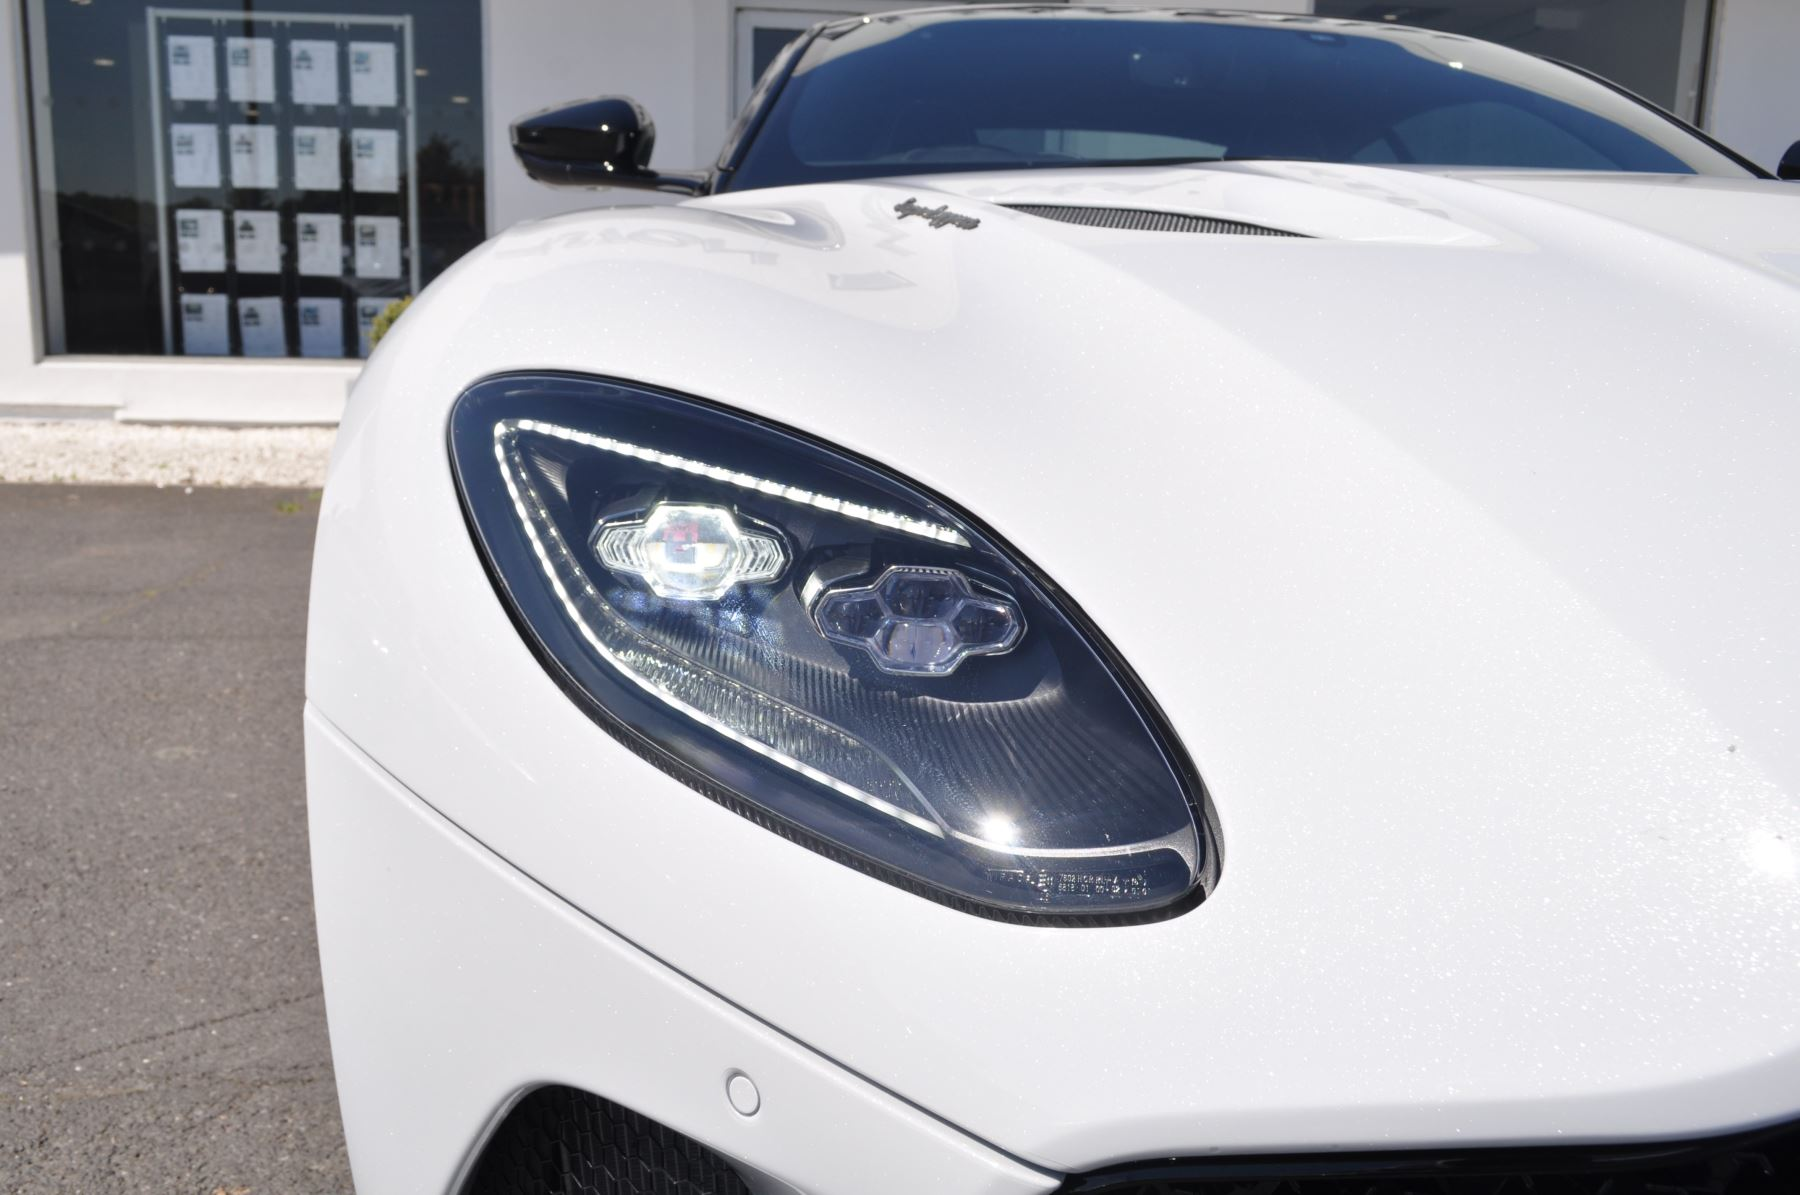 Aston Martin DBS V12 Superleggera 2dr Touchtronic image 48